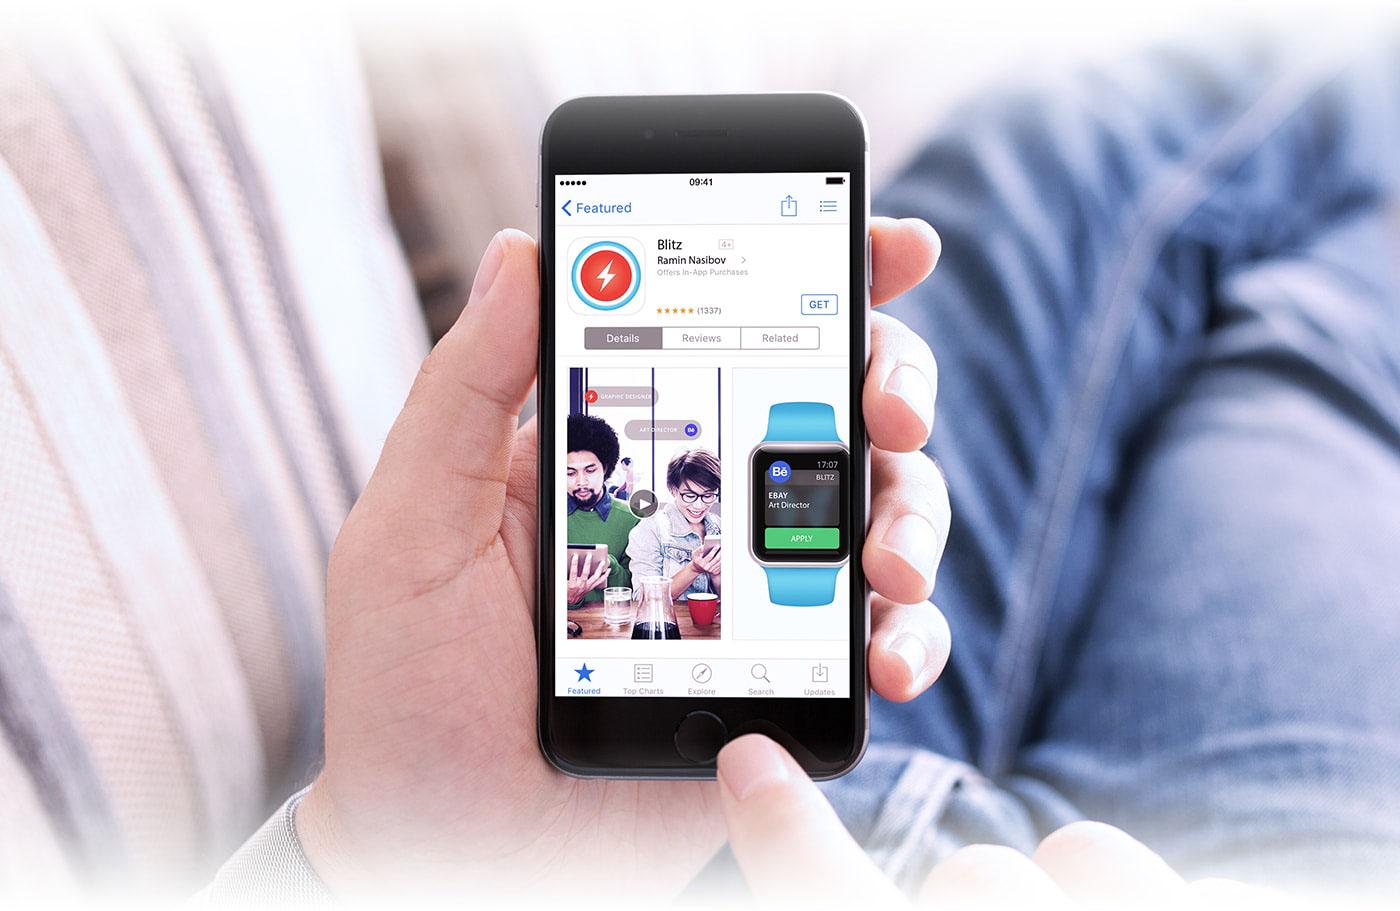 app,app design,job,jobfinder,creatives,creative,application,ios,apple watch,iwatches,brand,logo,identity,Application Design,app designer